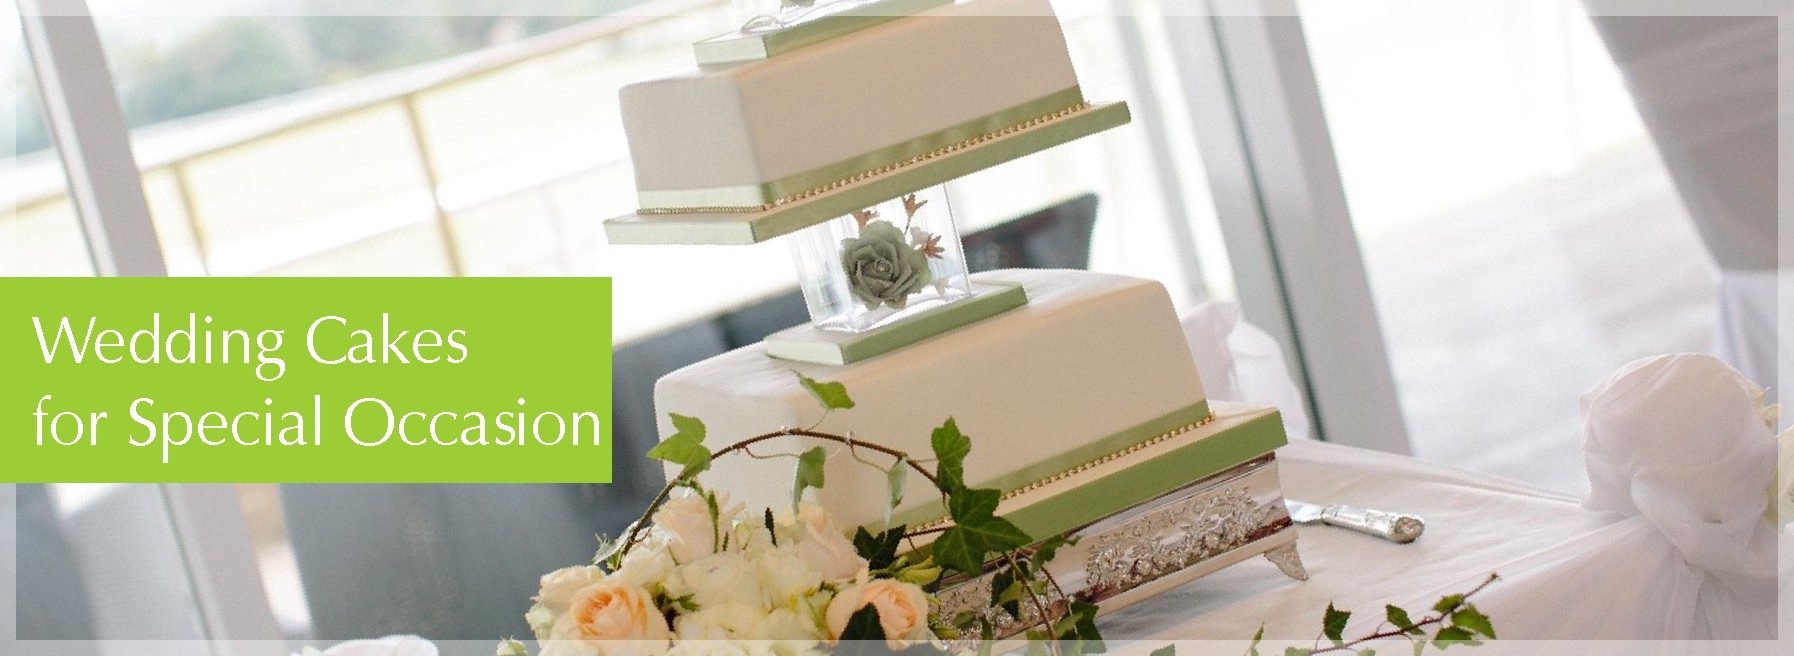 wedding cakes photo header